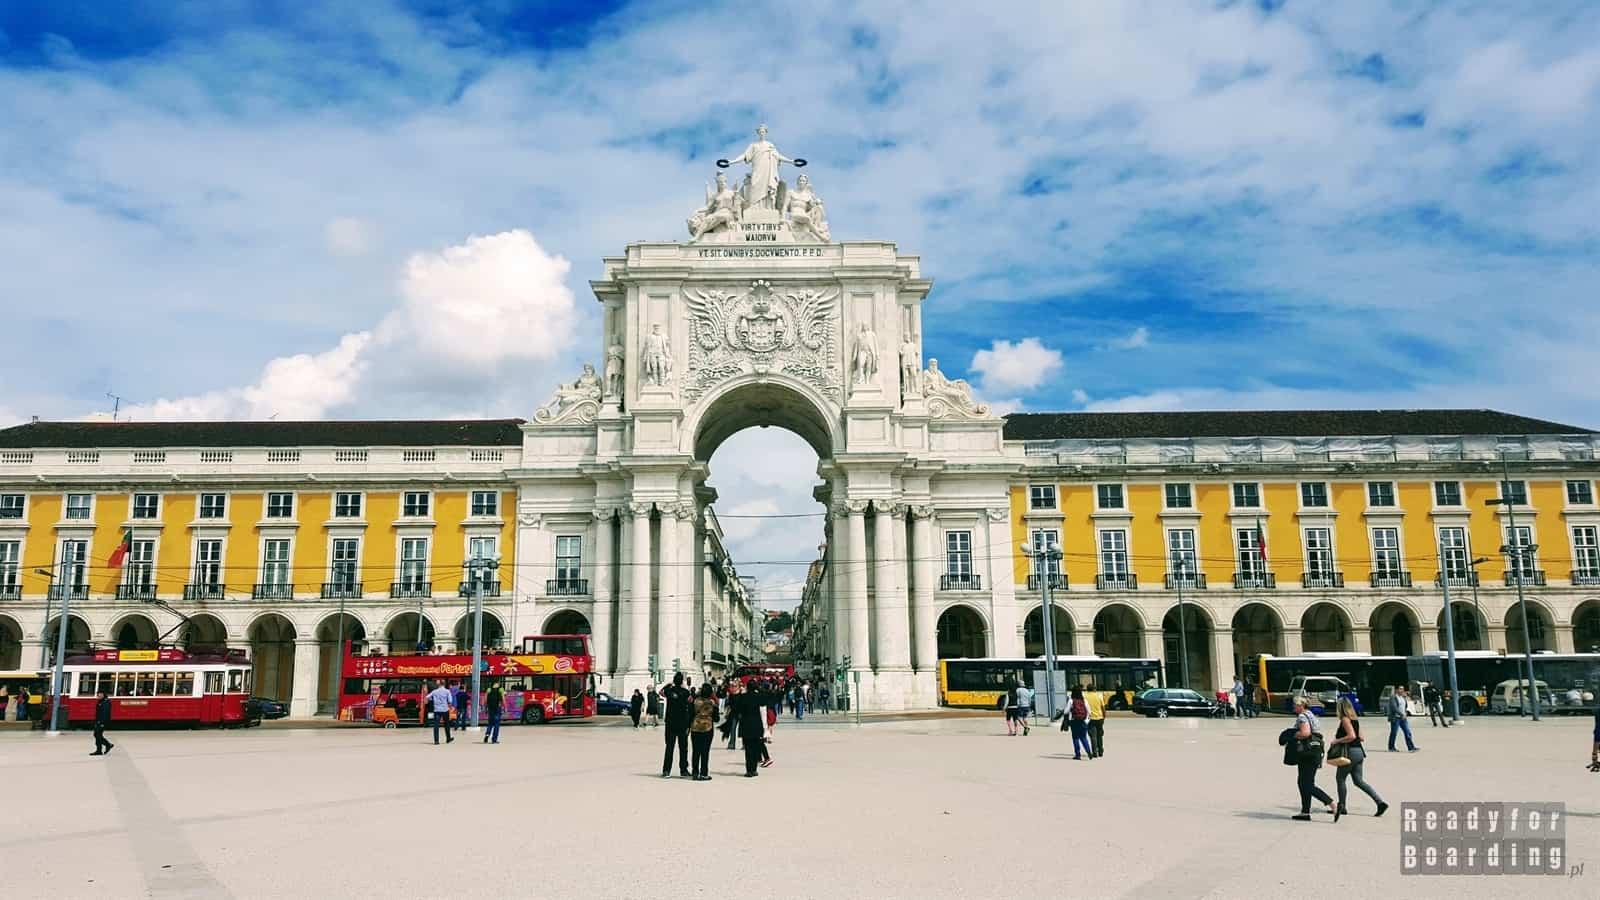 Portugalia - Lizbona cz. 1: Baixa i Alfama (galeria zdjęć)